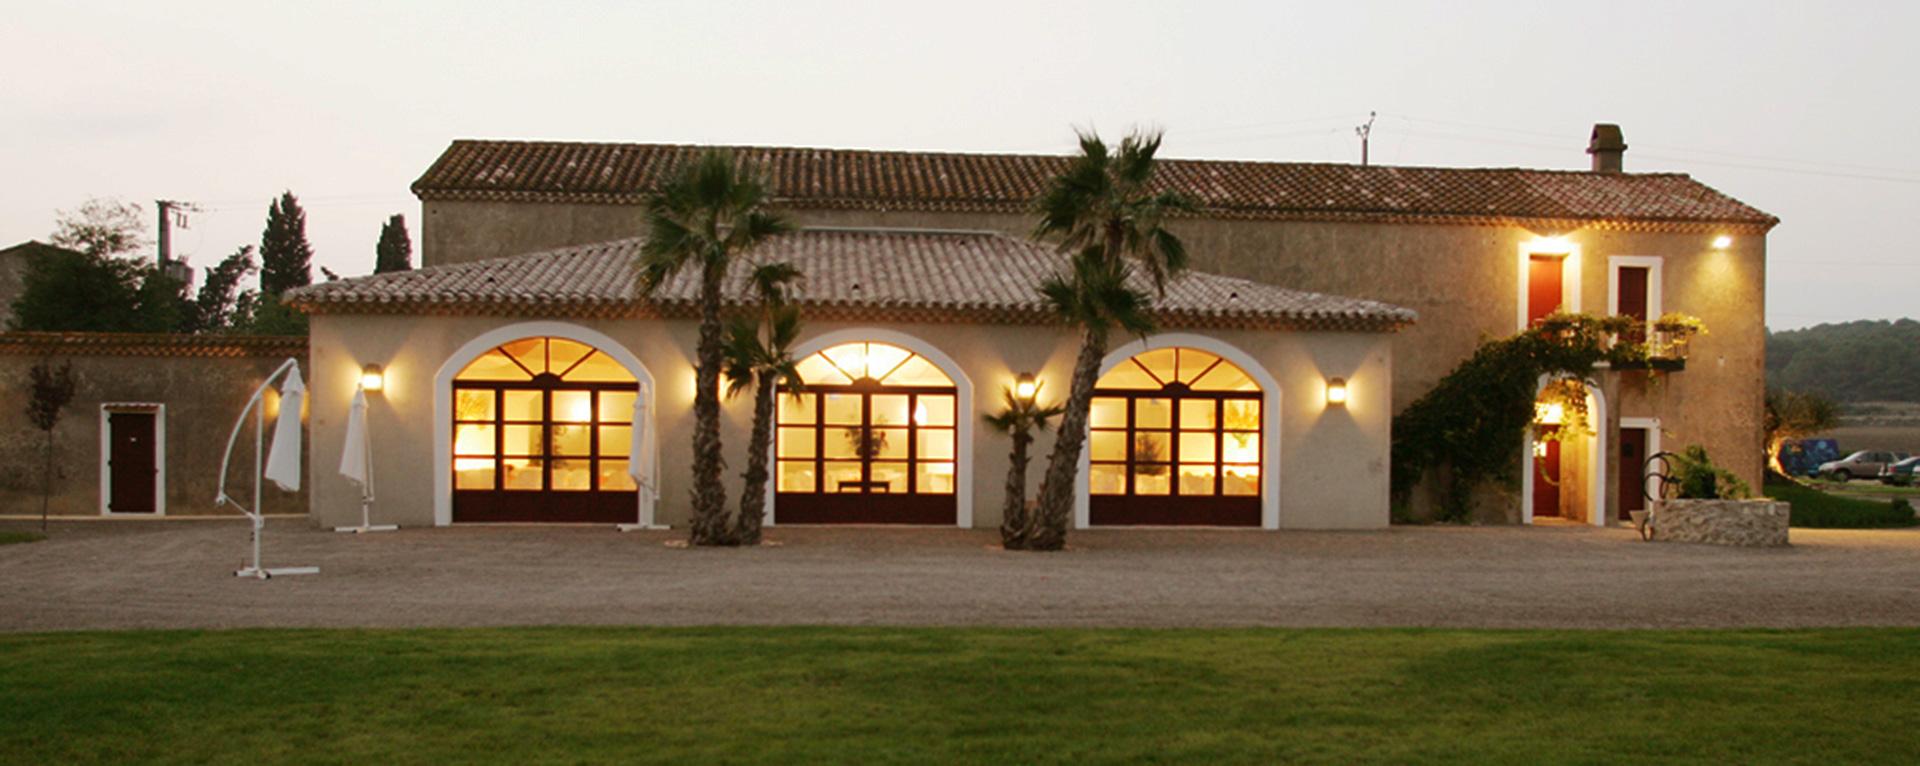 La Bergerie De La Vernede Location De Salle Pres De Beziers